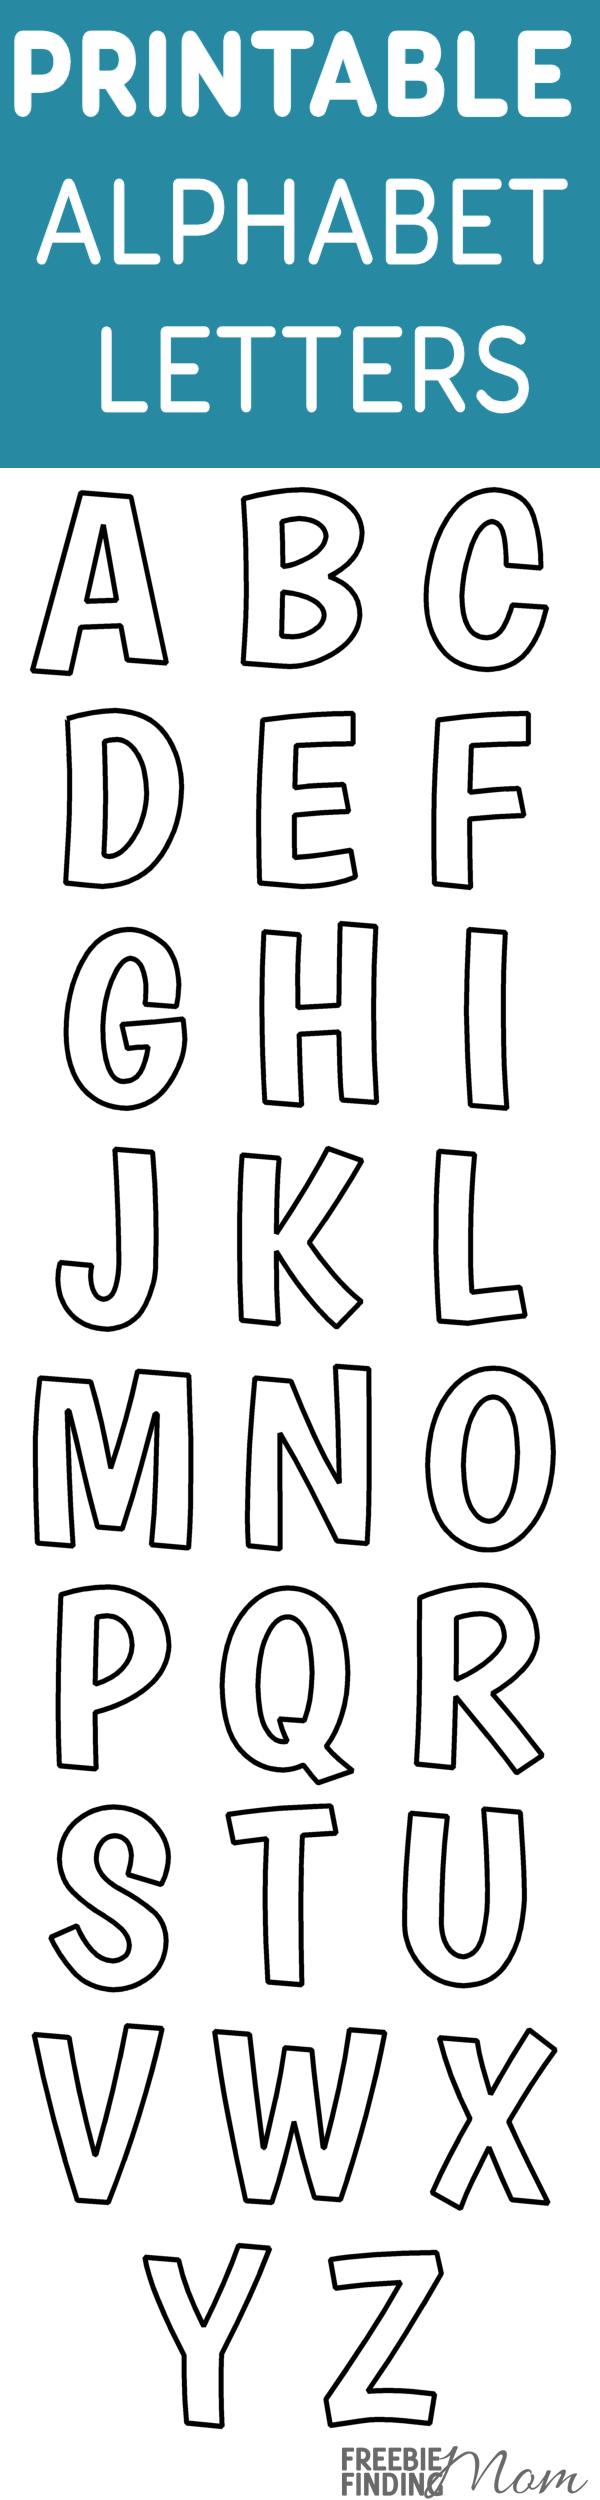 Printable FREE Alphabet Templates | drawings | Pinterest | Alphabet ...